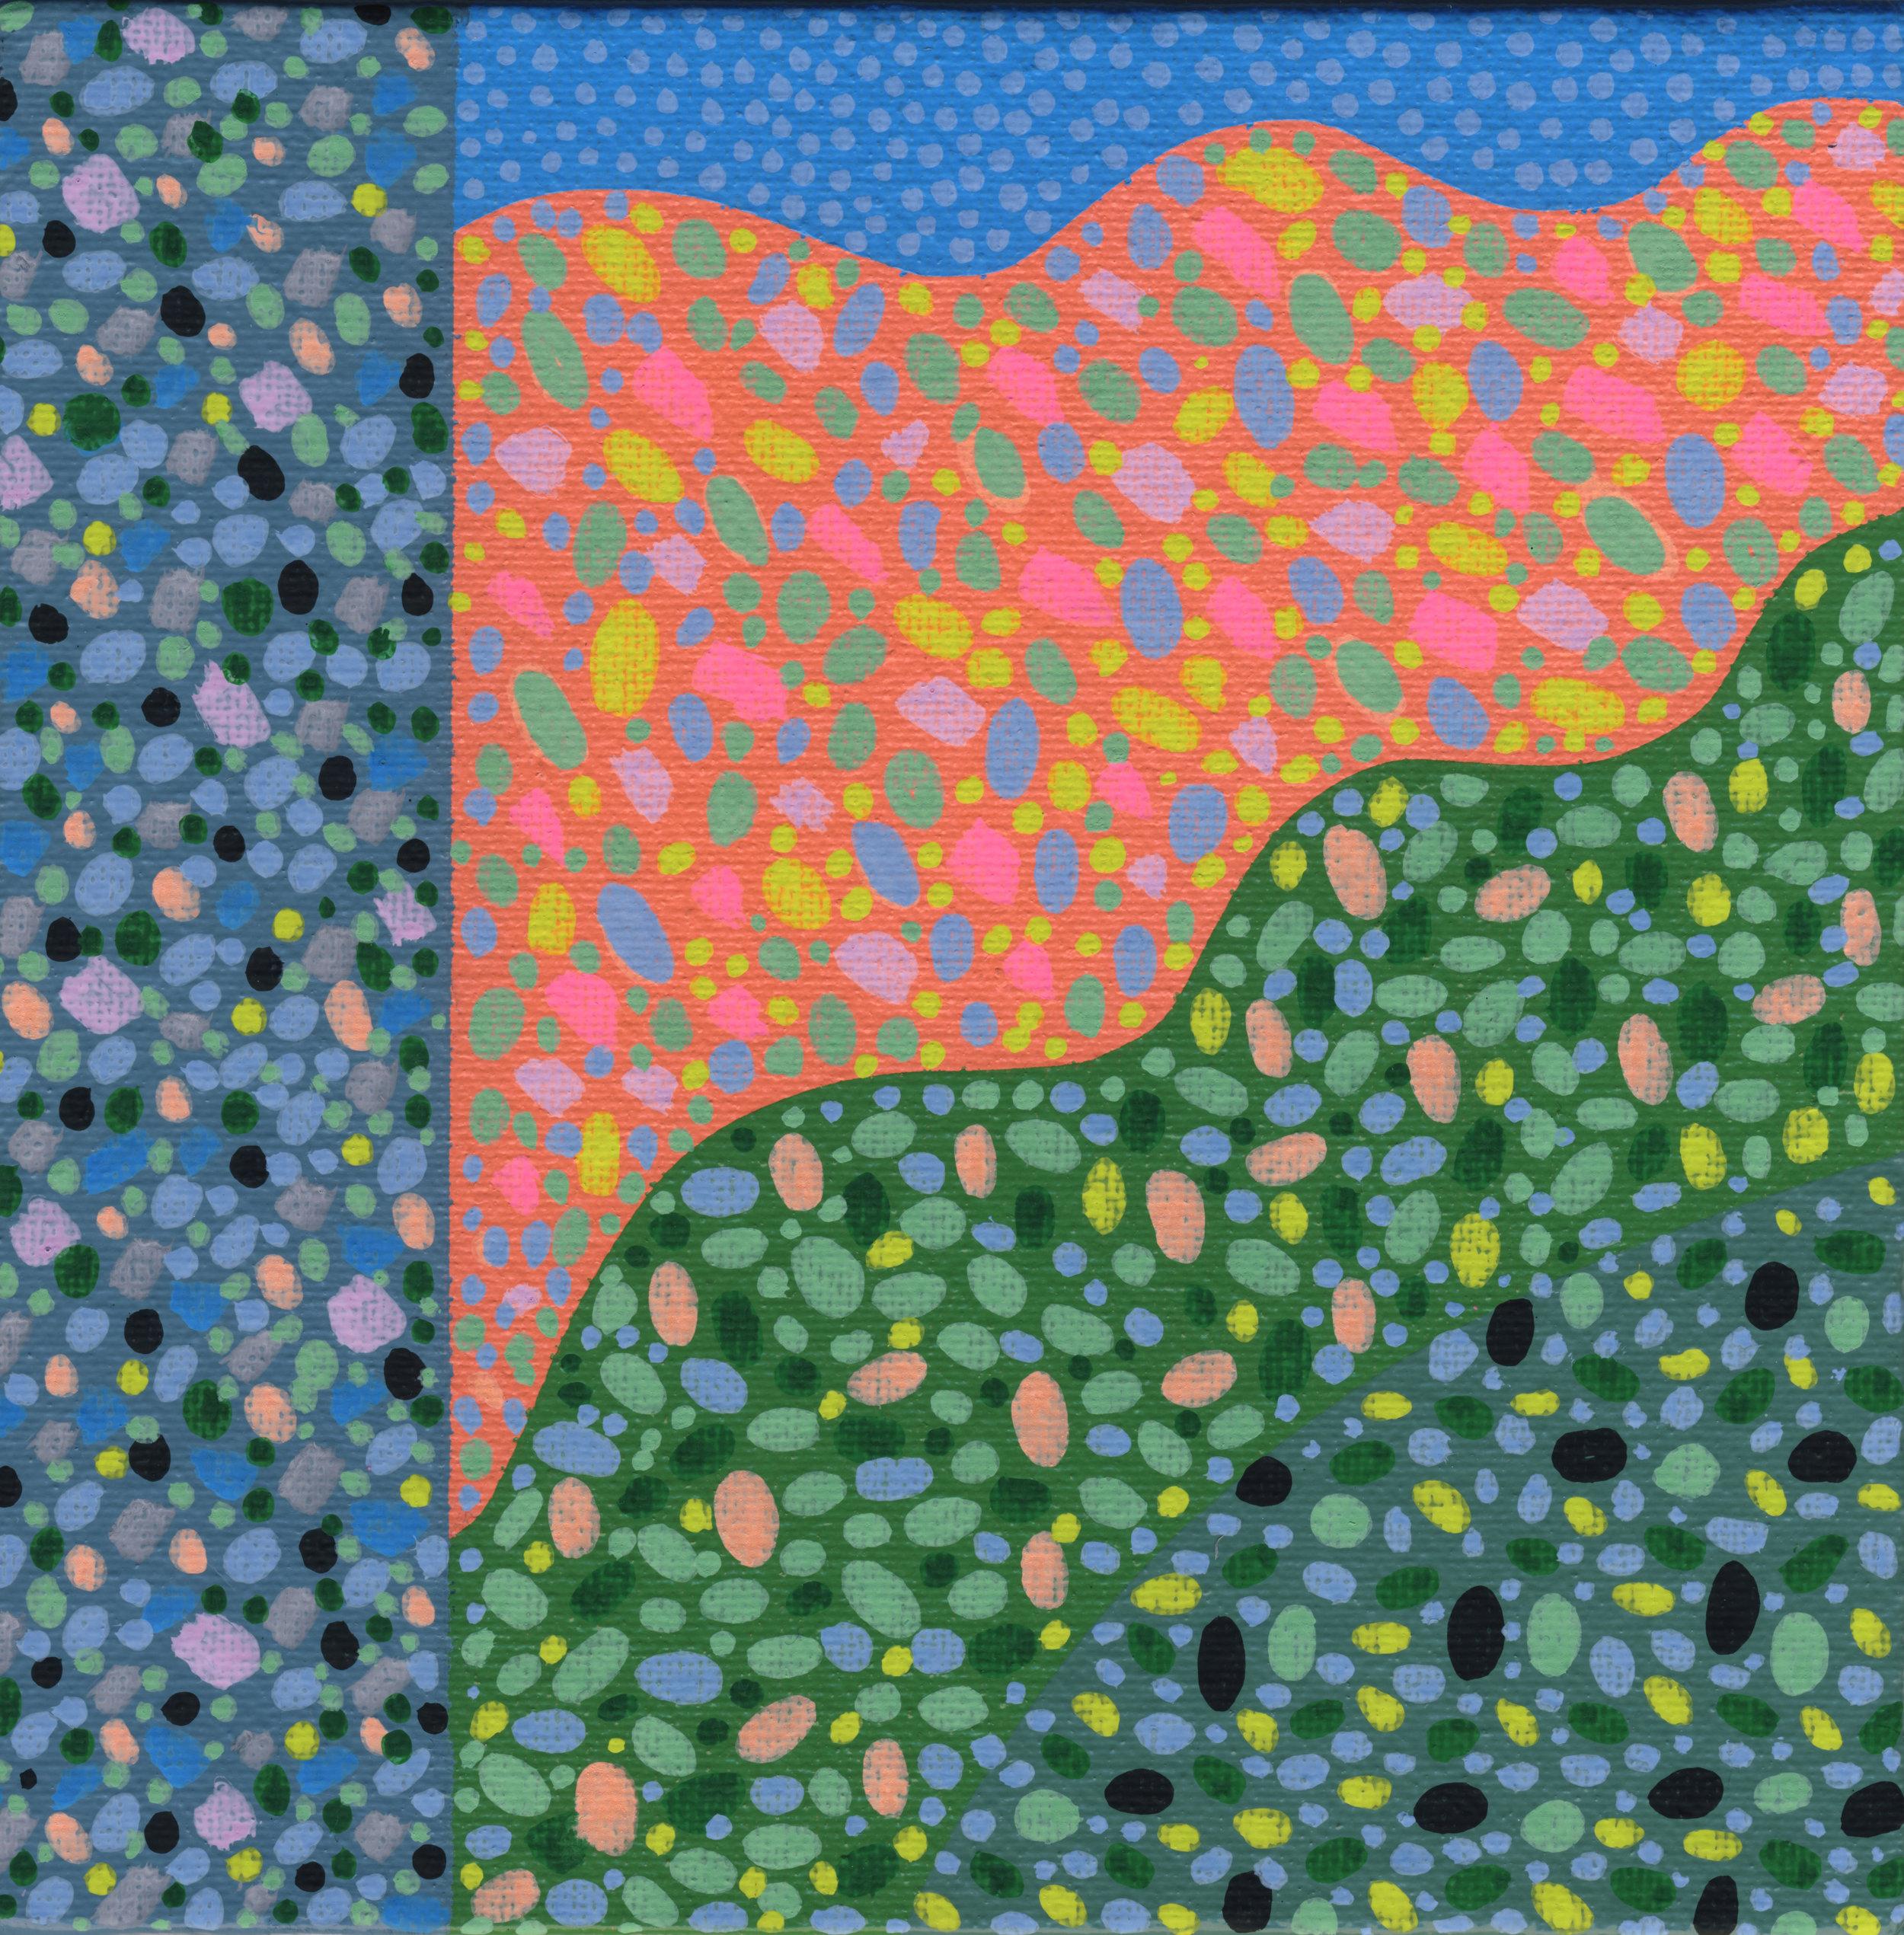 "37/100, Acrylic on canvas panel, 6"" X 6"", 2/12/19"